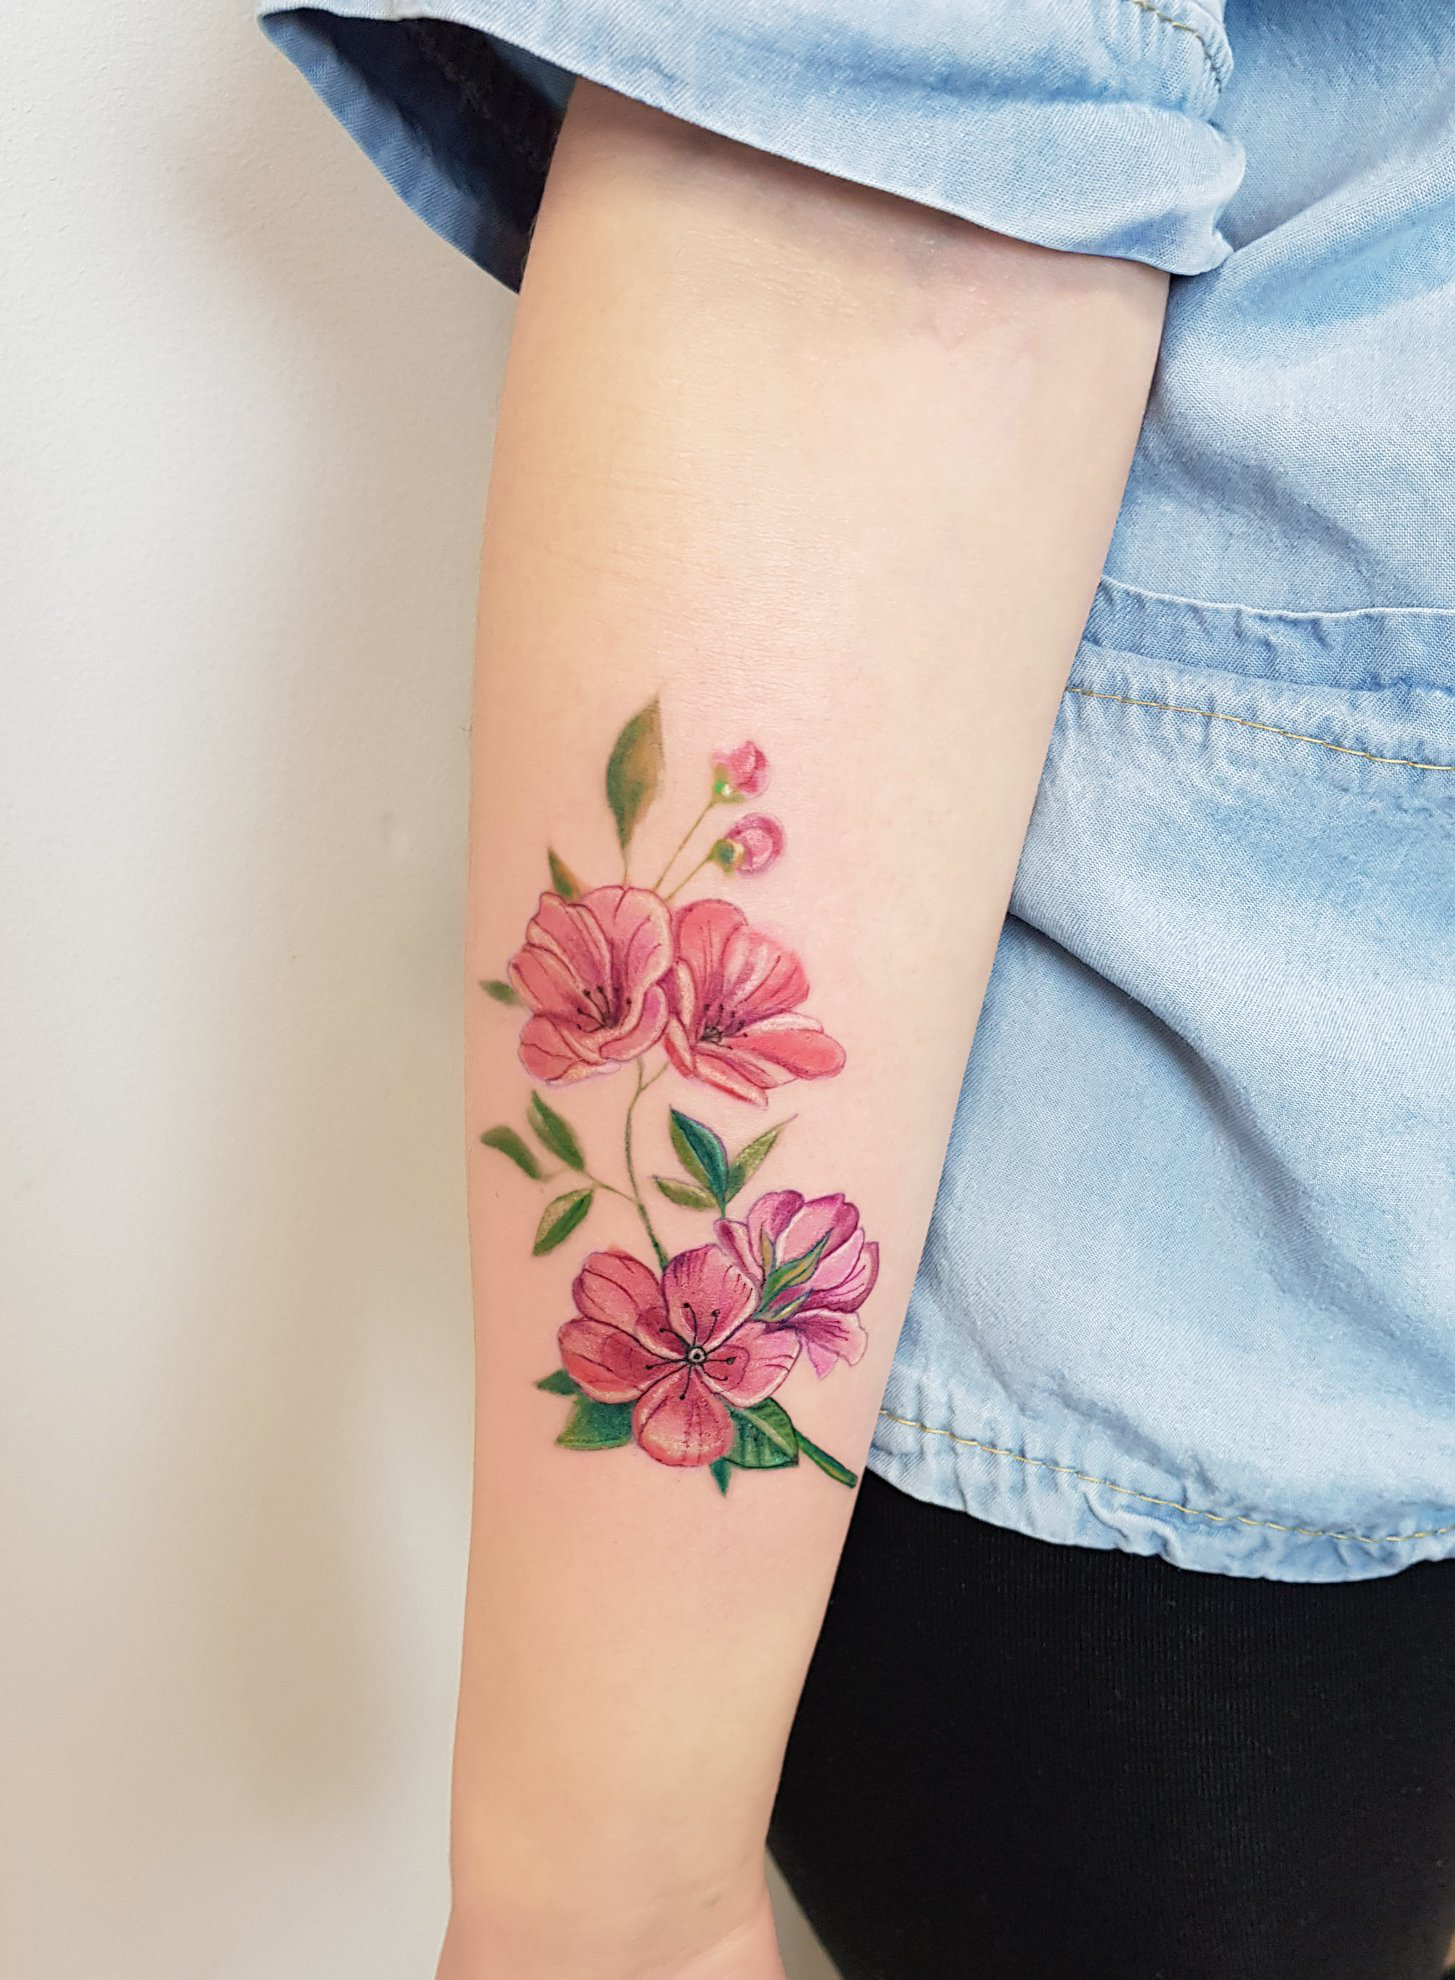 Inksearch tattoo LIDIA ROSE